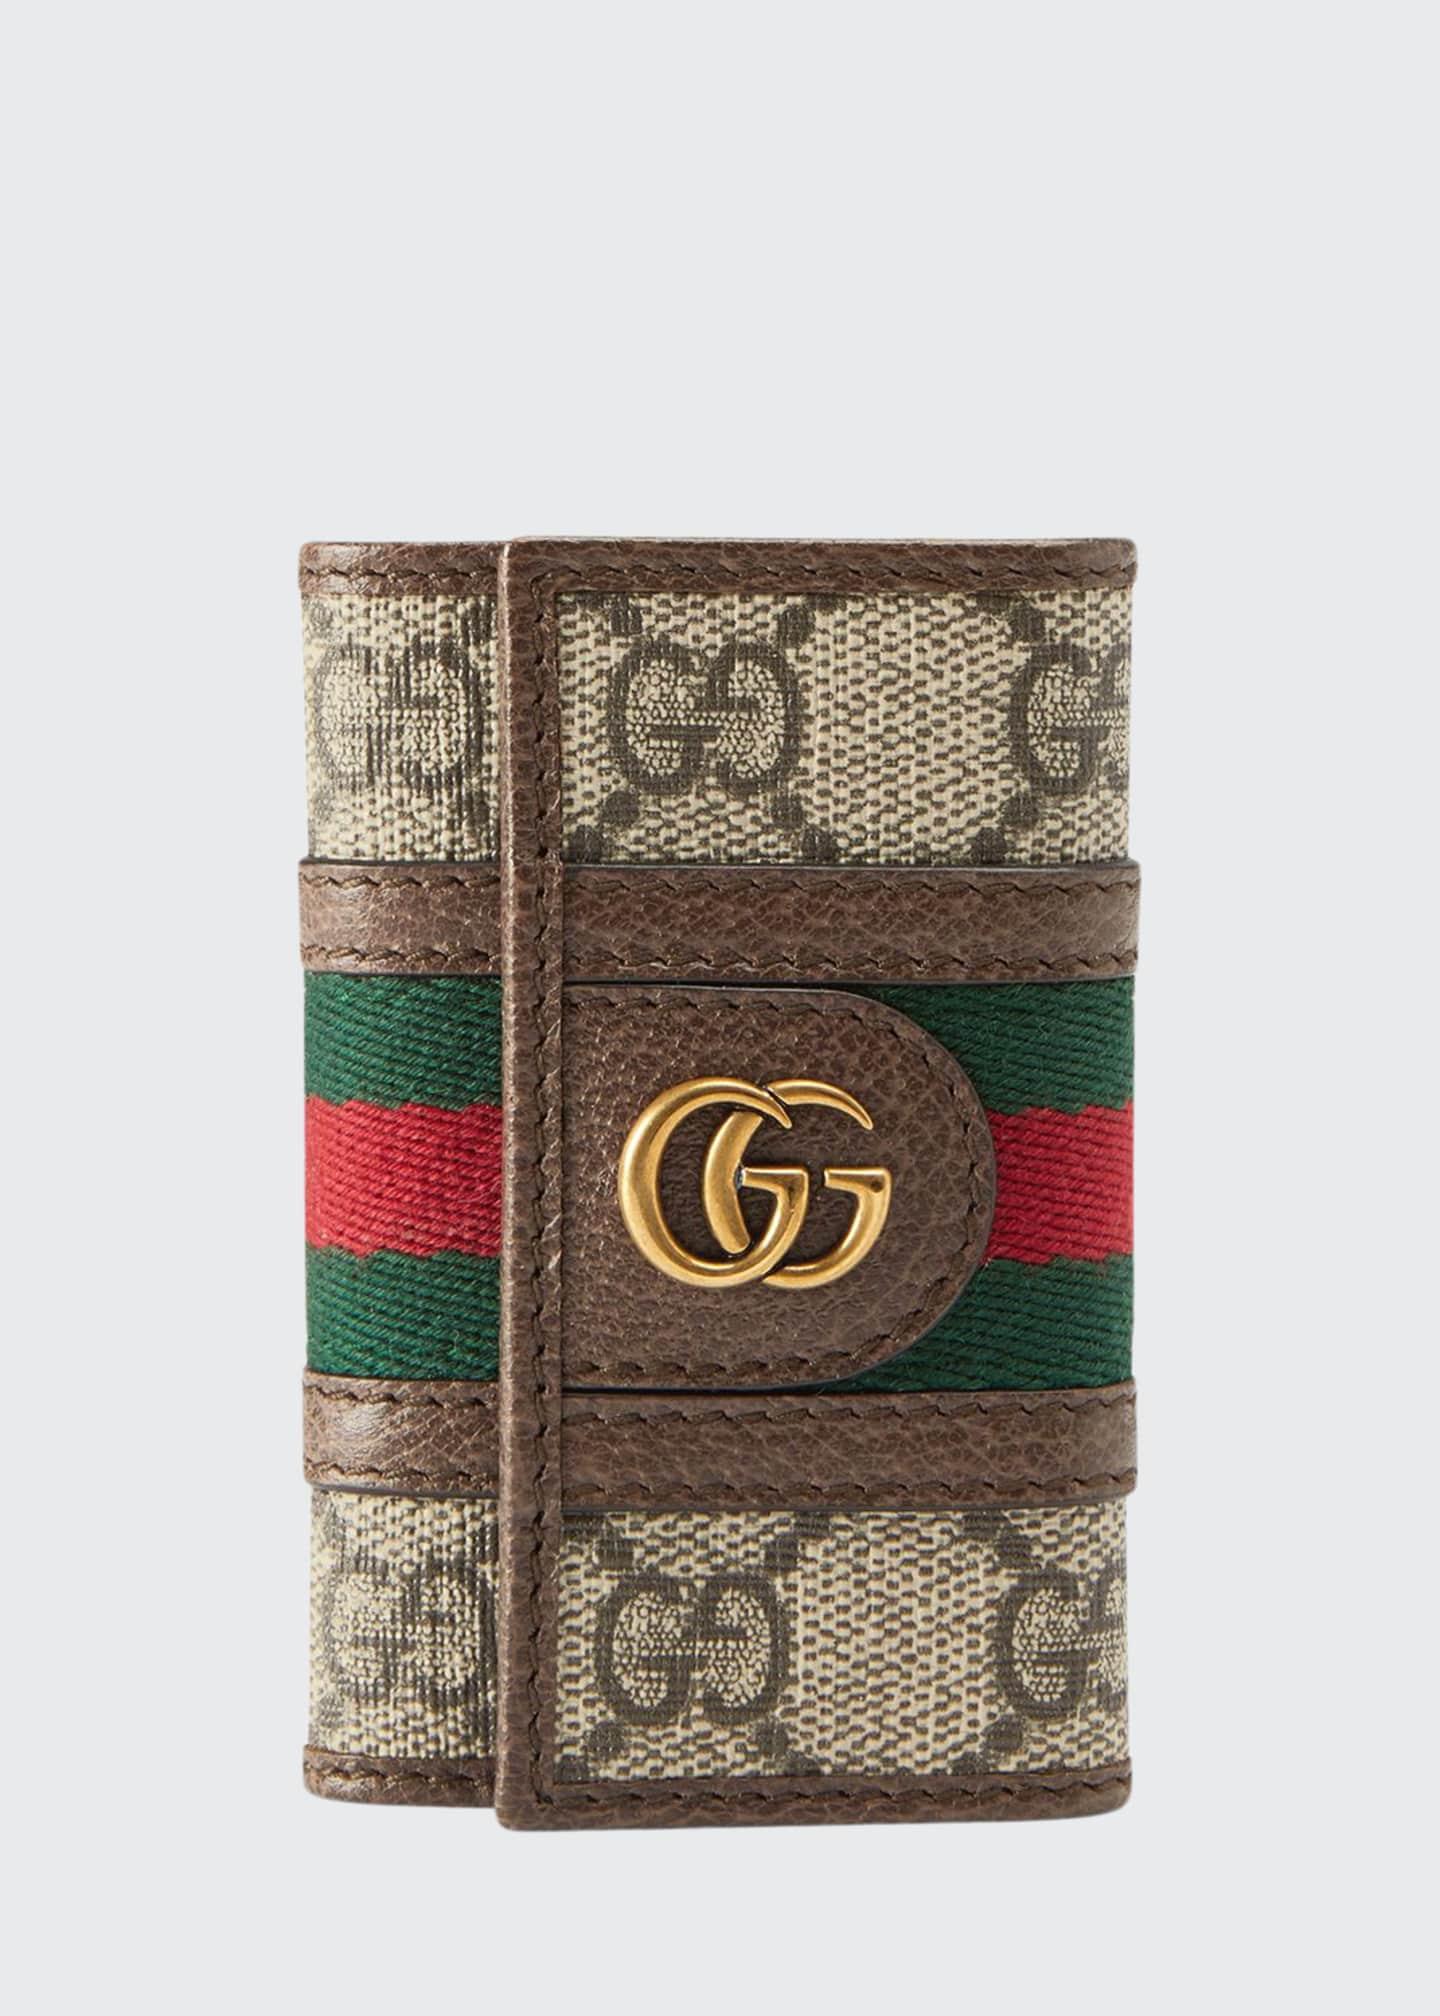 Gucci Men's GG Supreme Marmont Flap Wallet